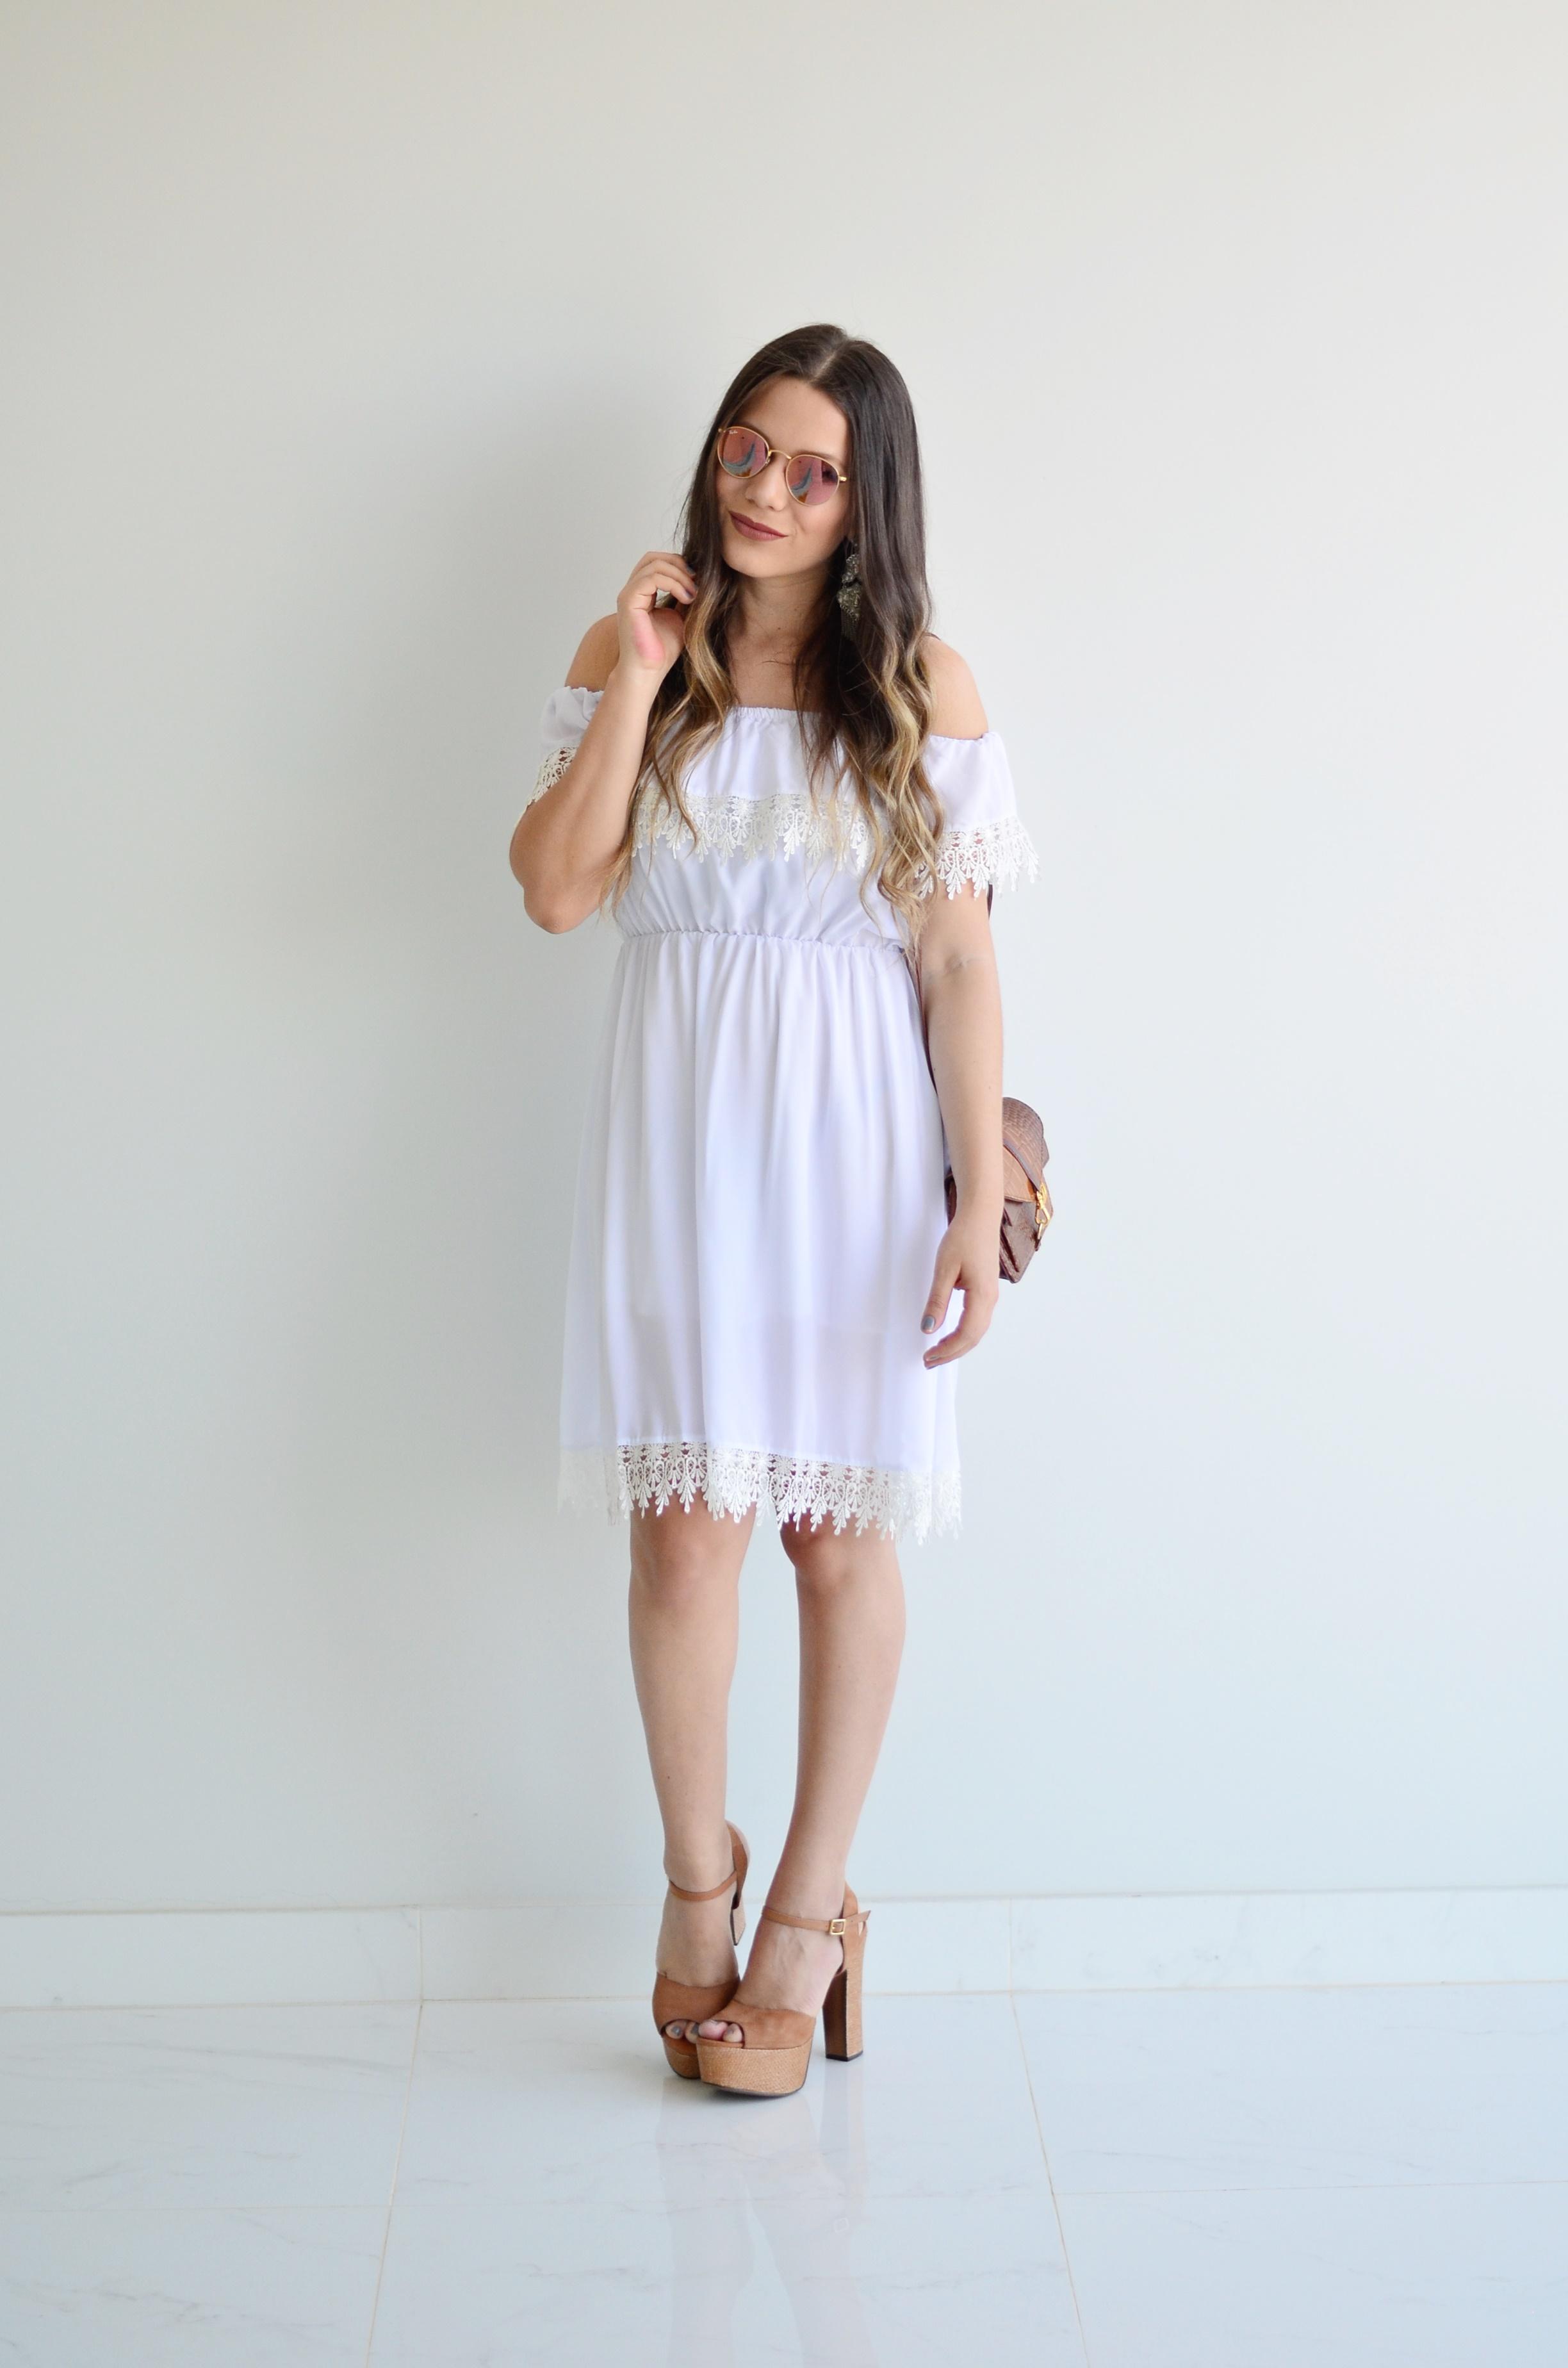 look-duplo-vestido-e-conjunto-branco-mini-bag-ft-alice-vivianny-6